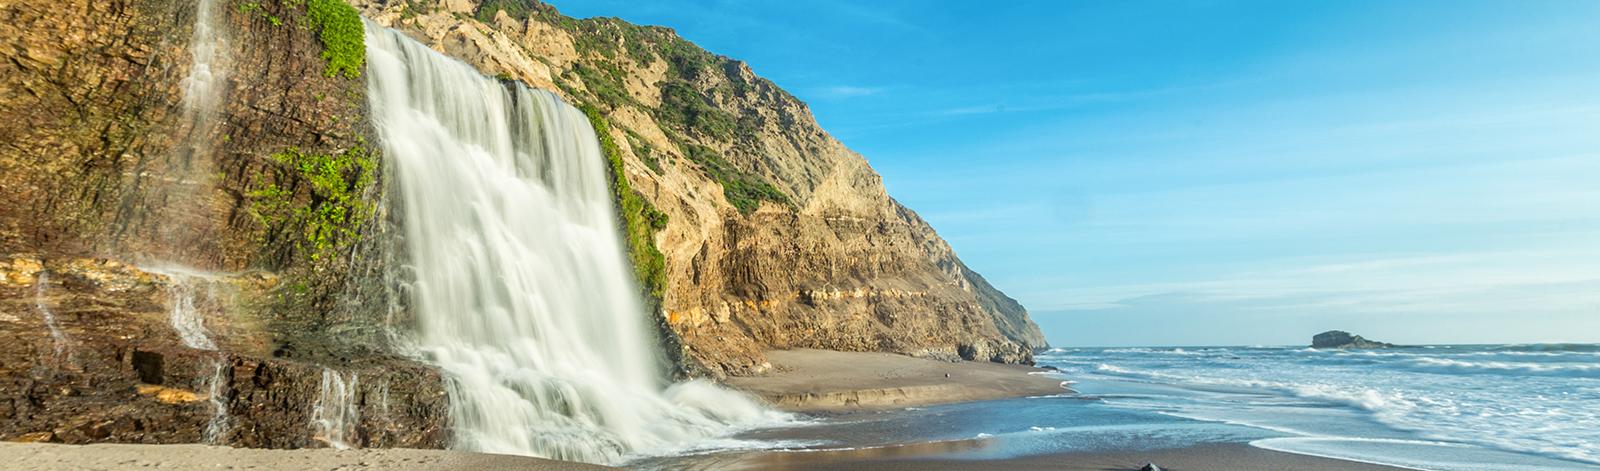 Alamere Waterfalls, Marin County California